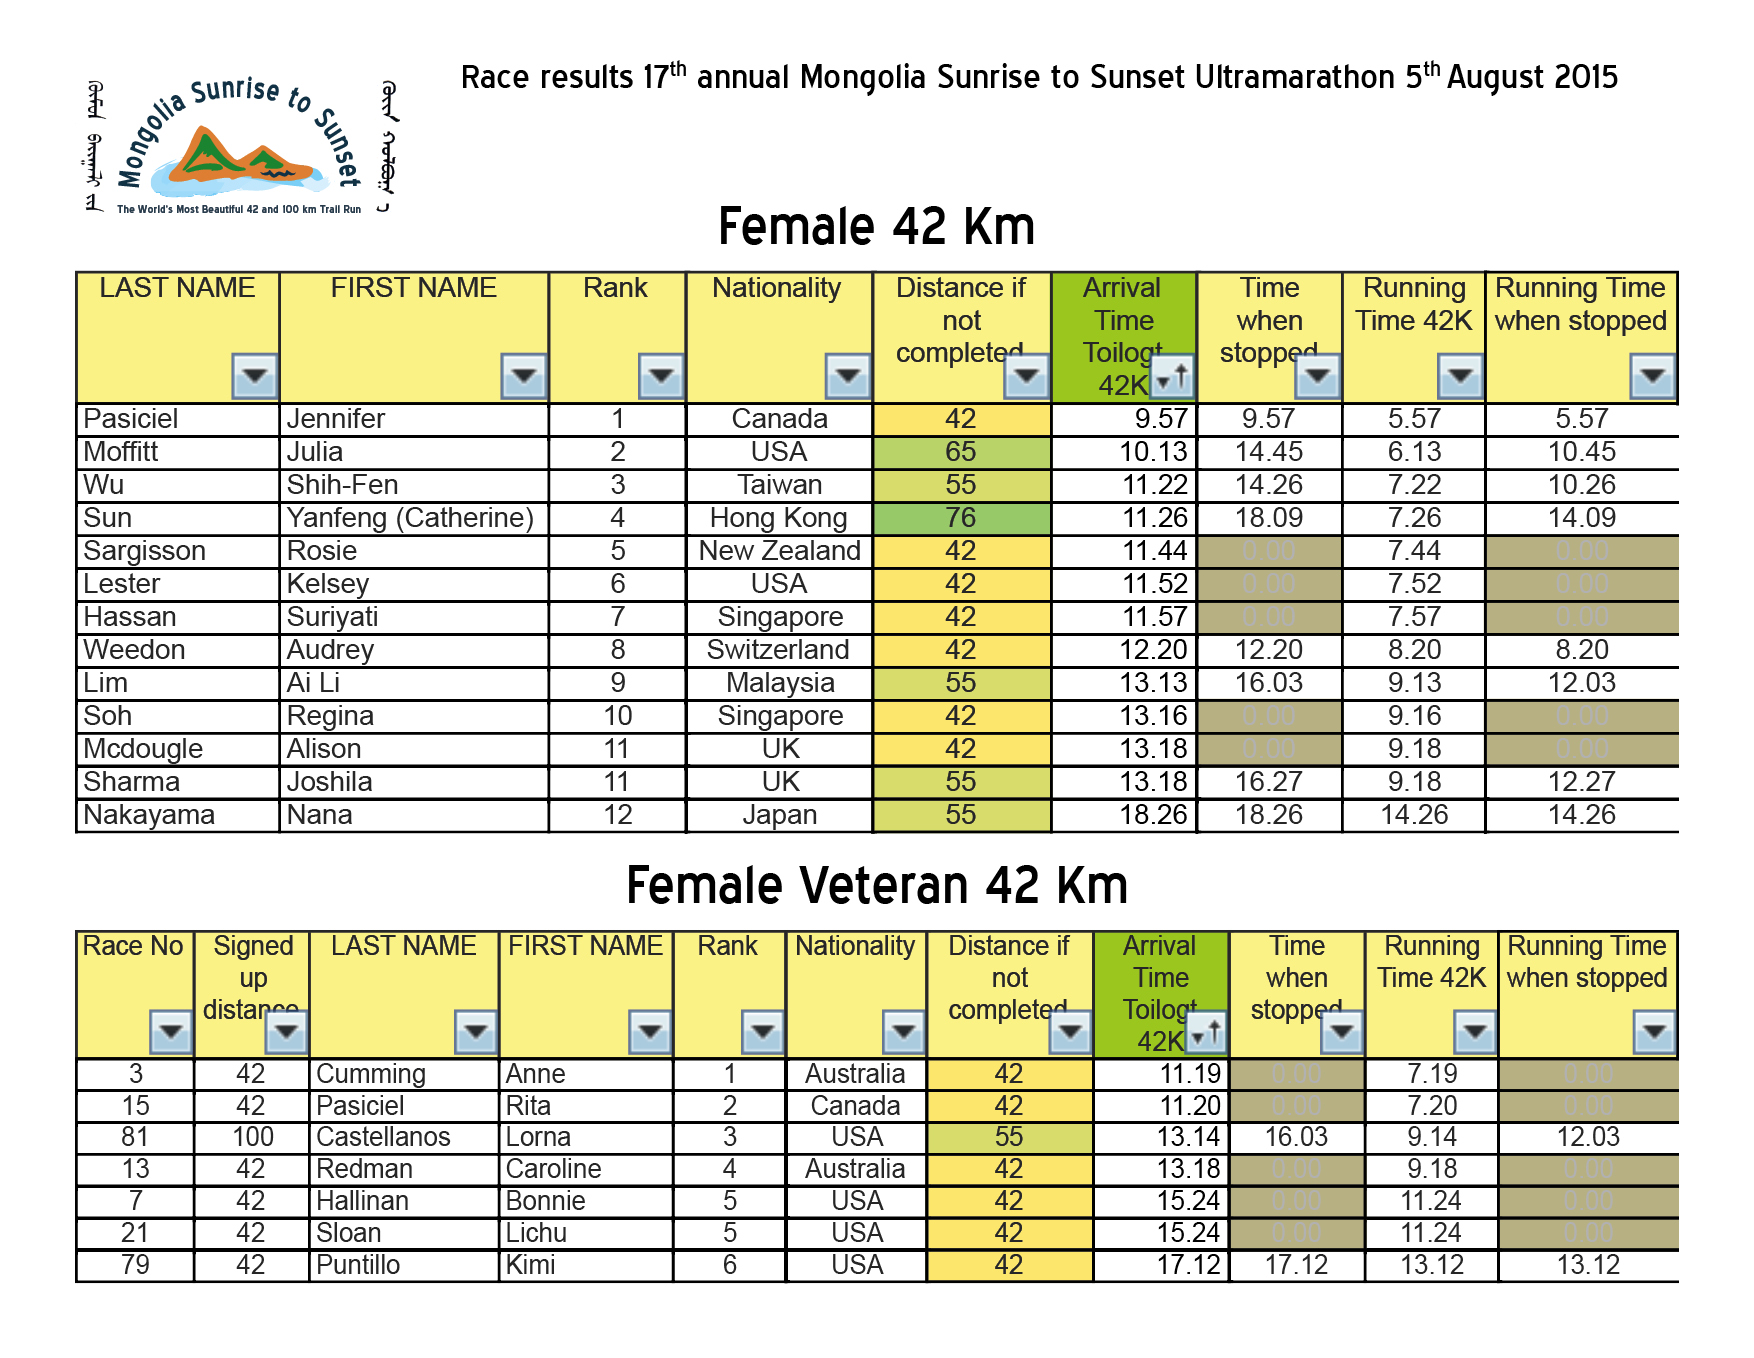 Race results 17th annual Mongolia Sunrise to Sunset 2015 Ultramarathon